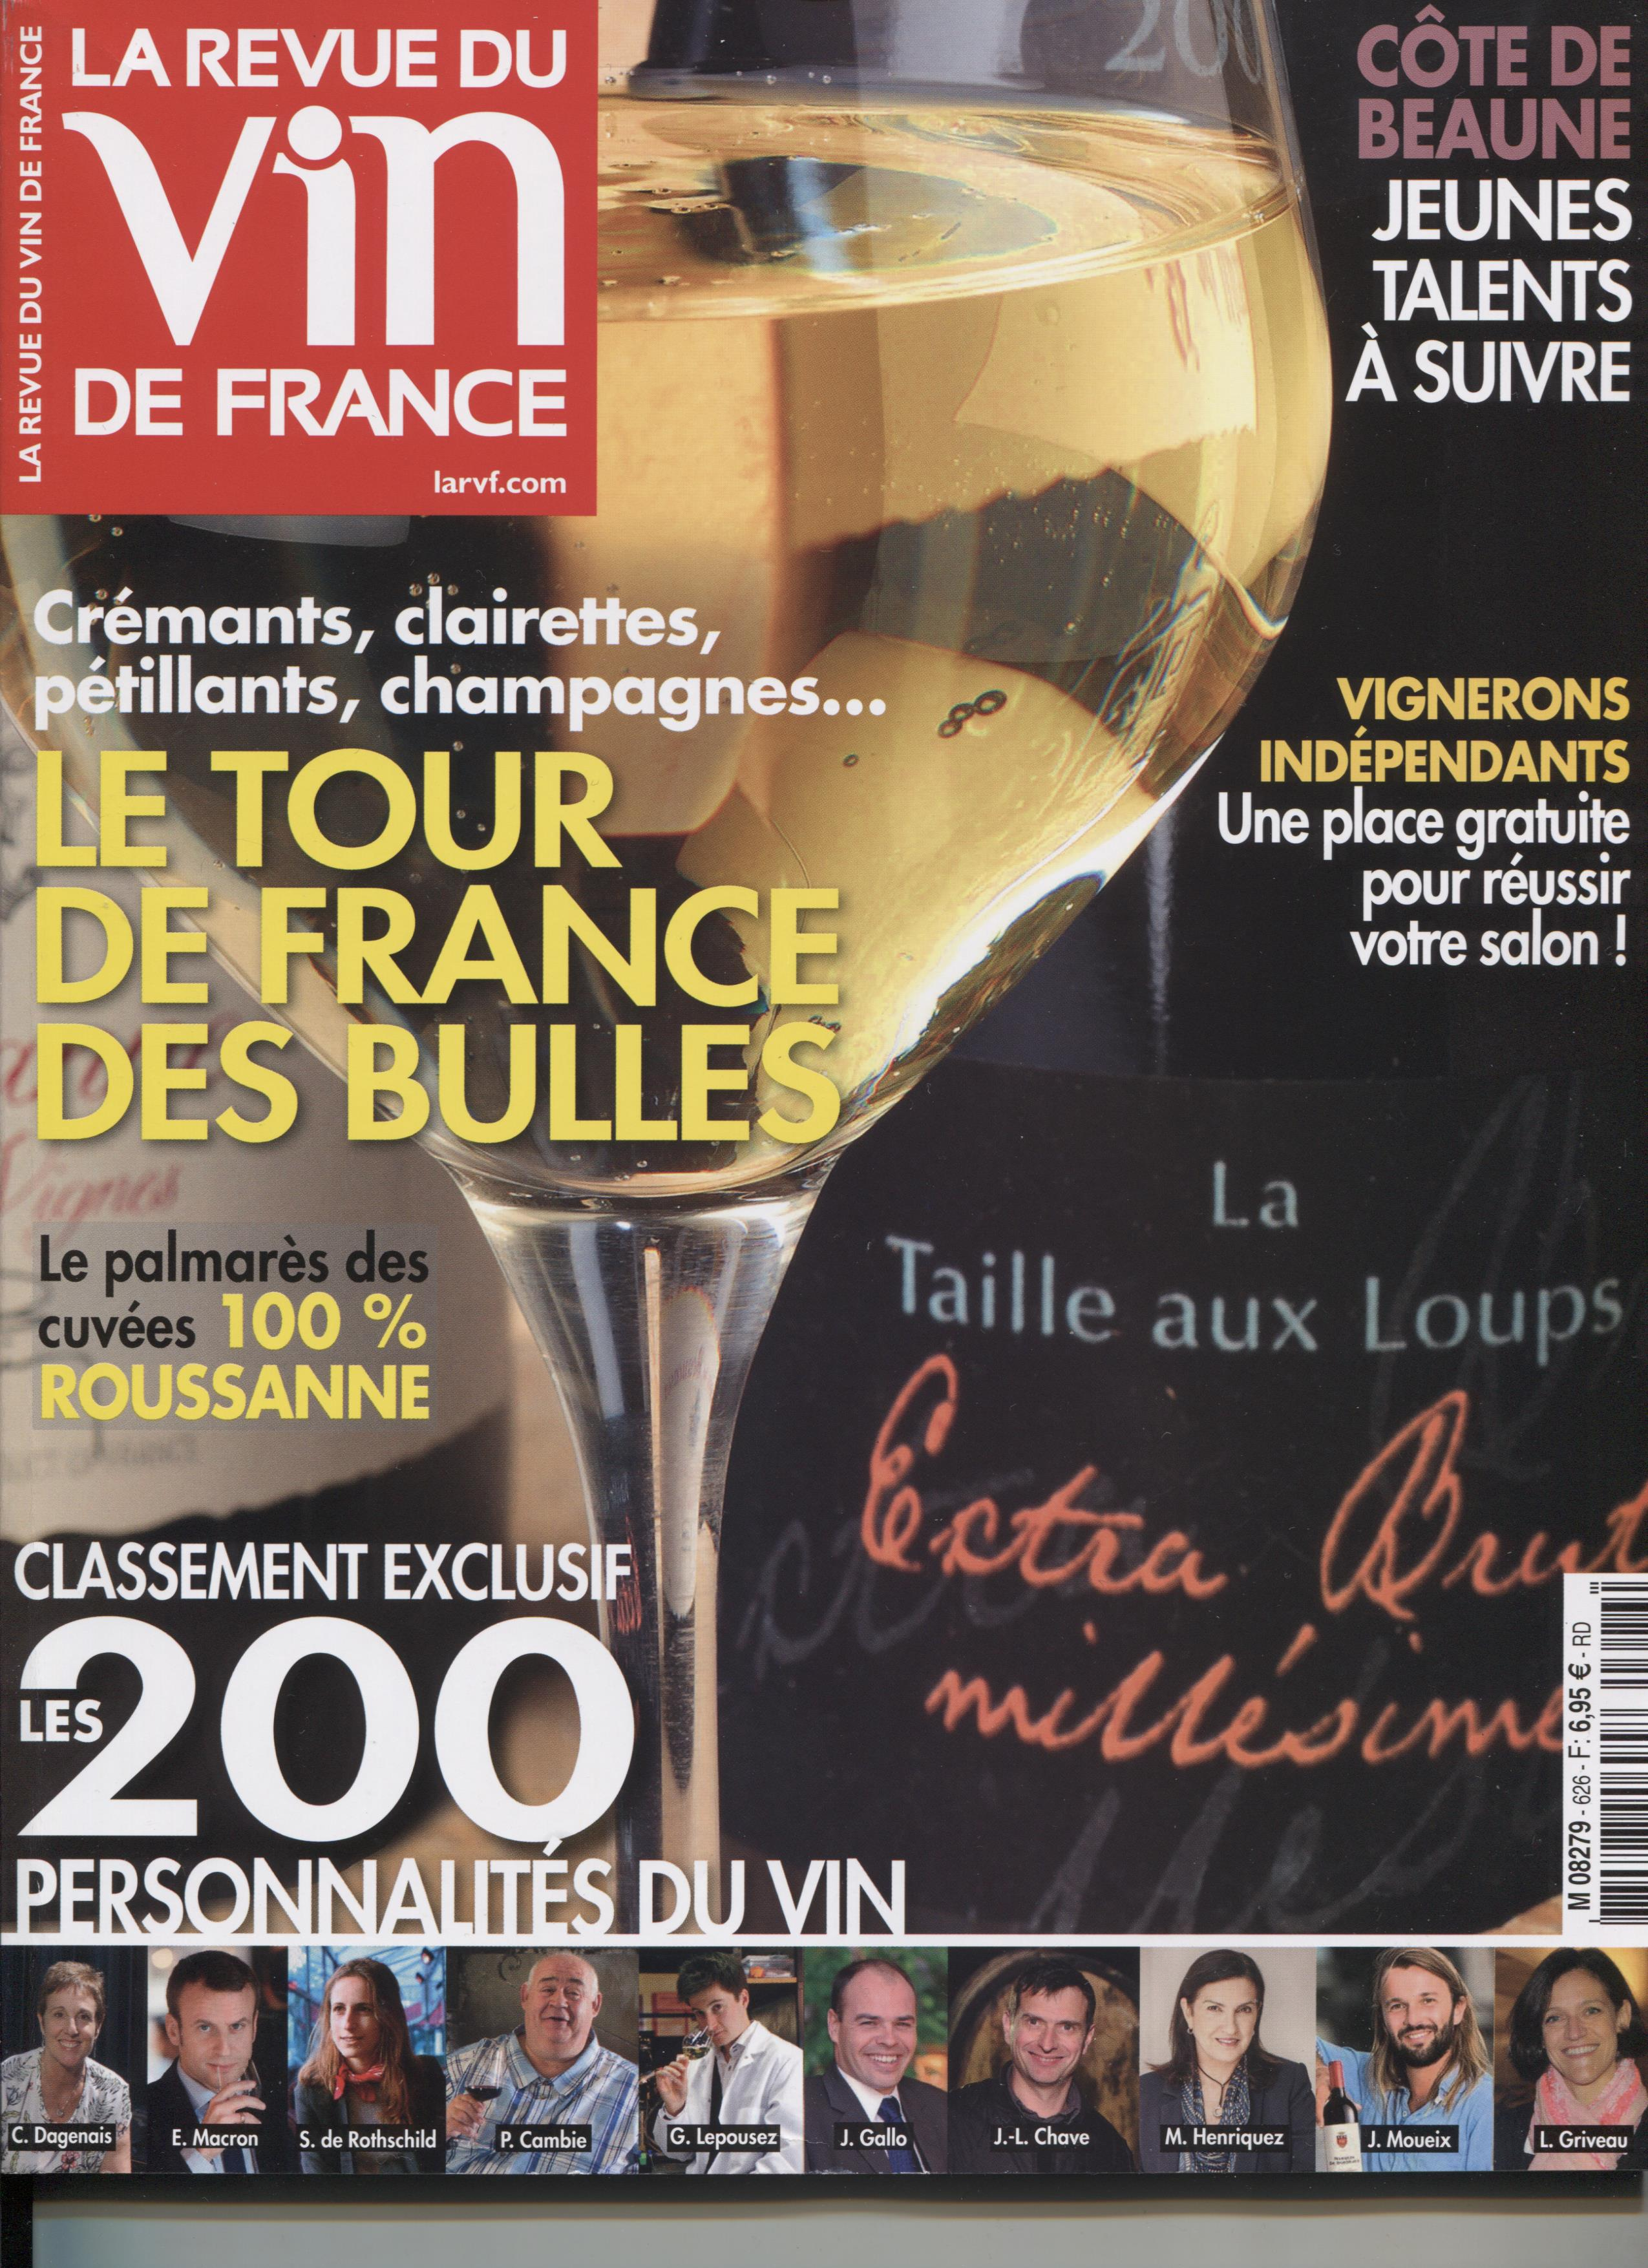 LA REVUE DU VIN DE FRANCE NOVEMBRE 2018